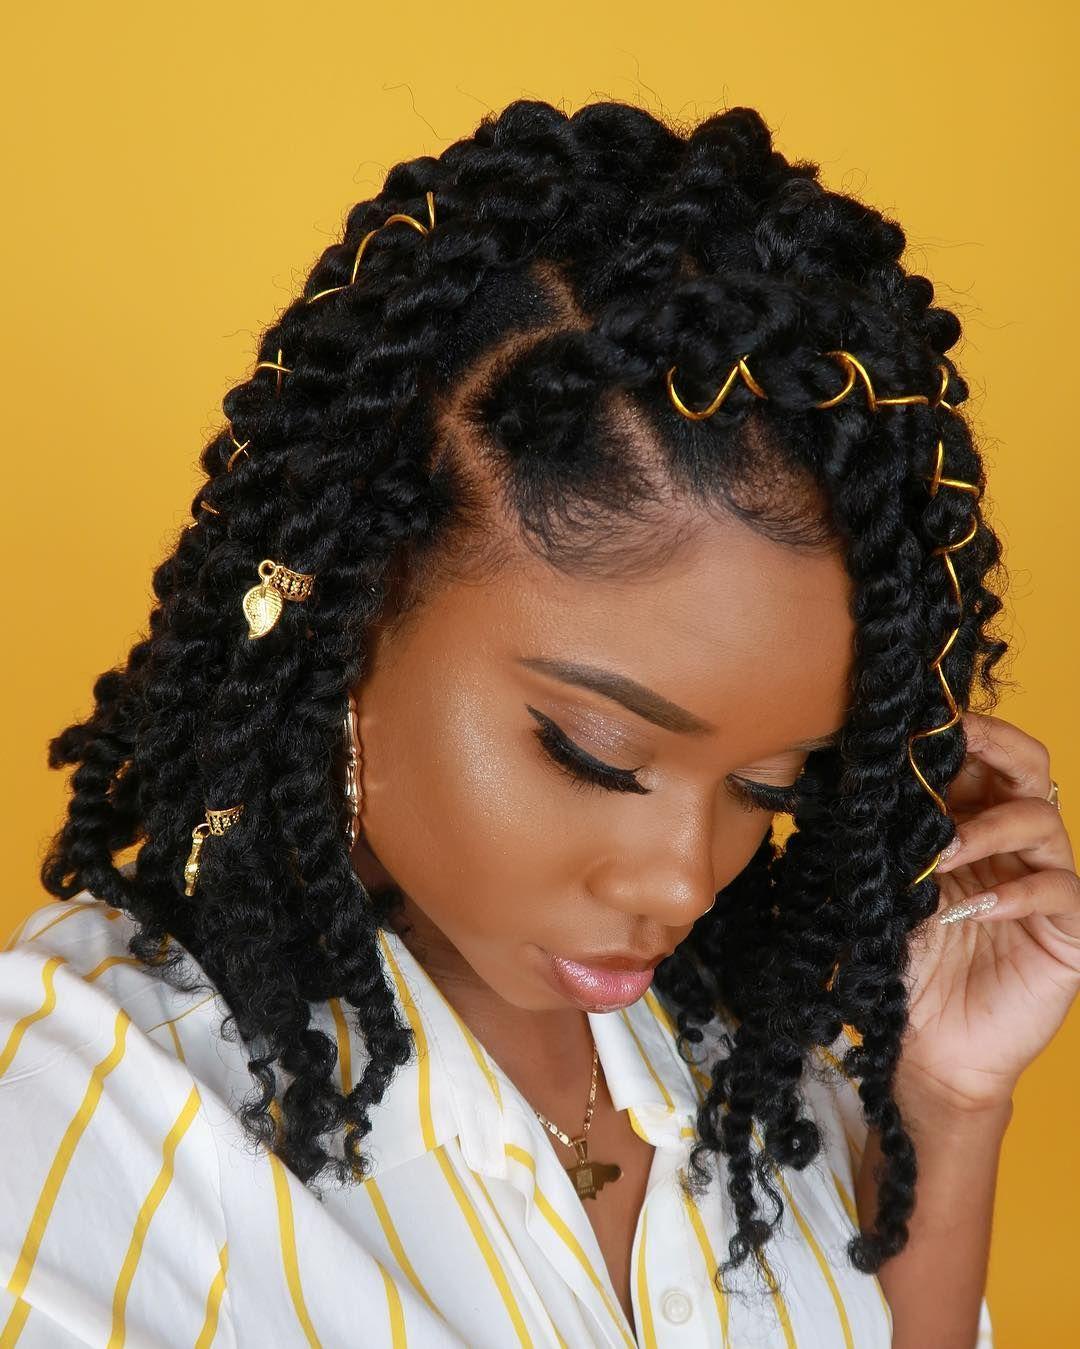 Passion Twist Hair Natural Black Water Wave Bohemian Braids Summer Hairdos Natural Hair Styles Twist Hairstyles